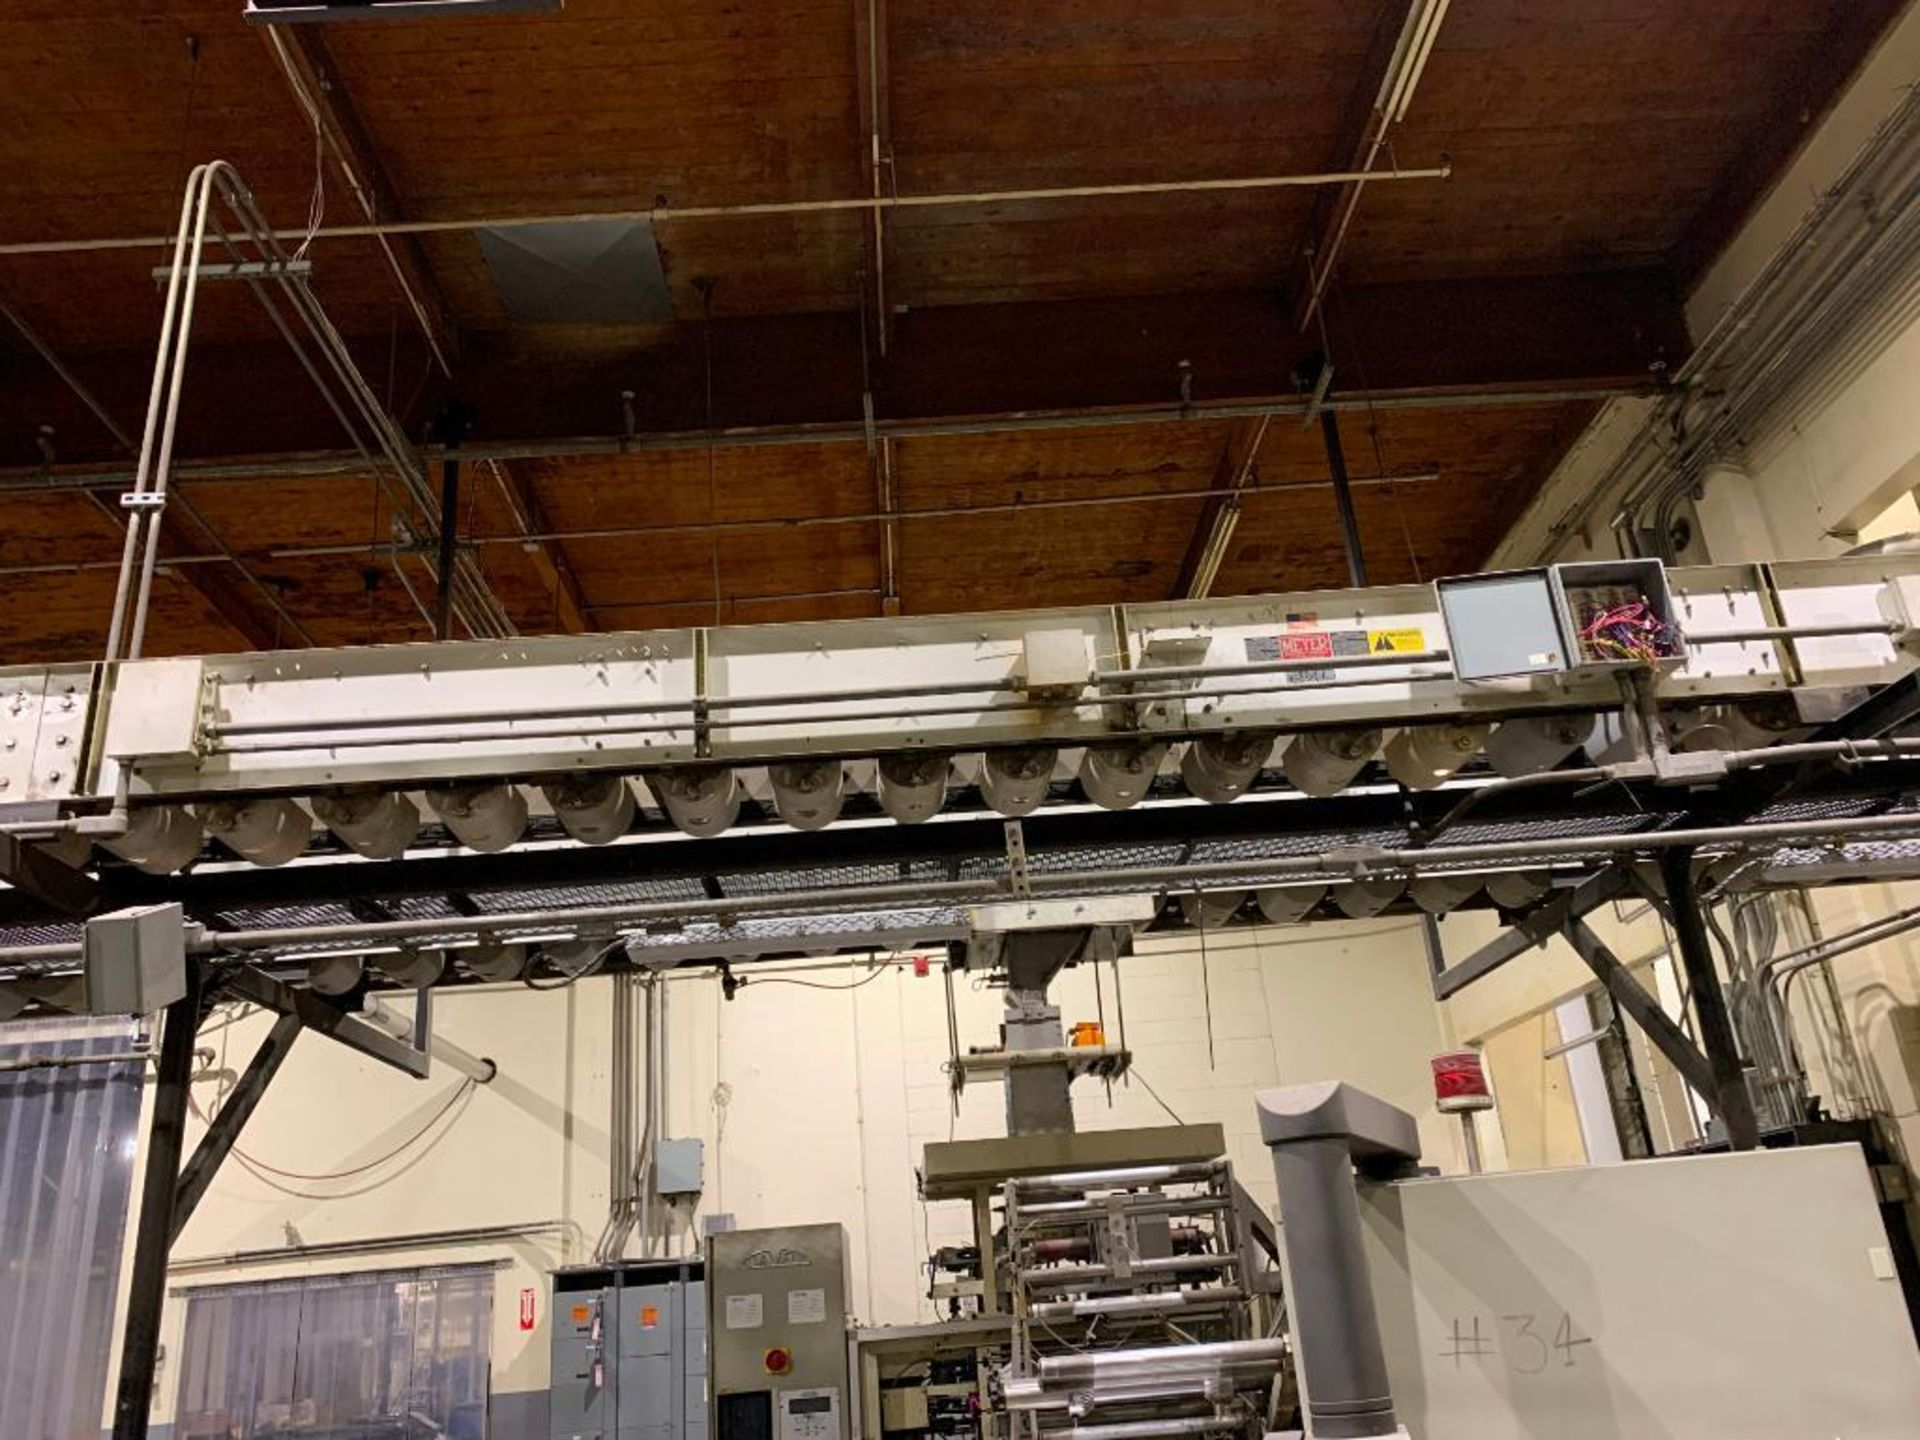 Meyer horizontal bucket conveyor, model PC-172-1213CC - Image 12 of 18